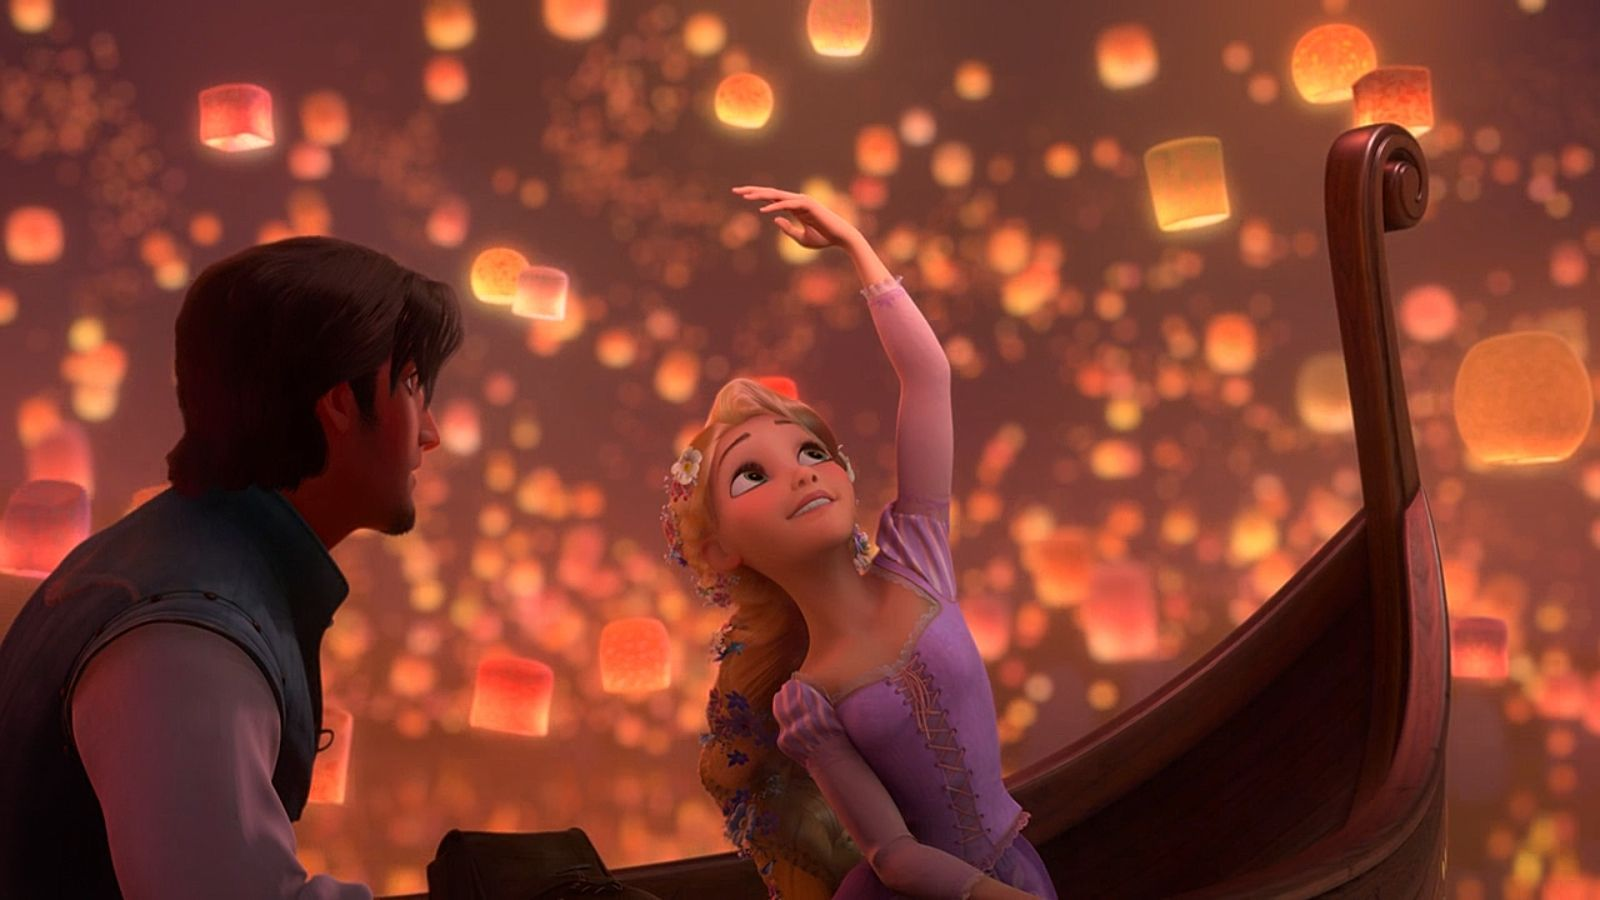 Cartoon Disney Tangled Wallpaper Download HD